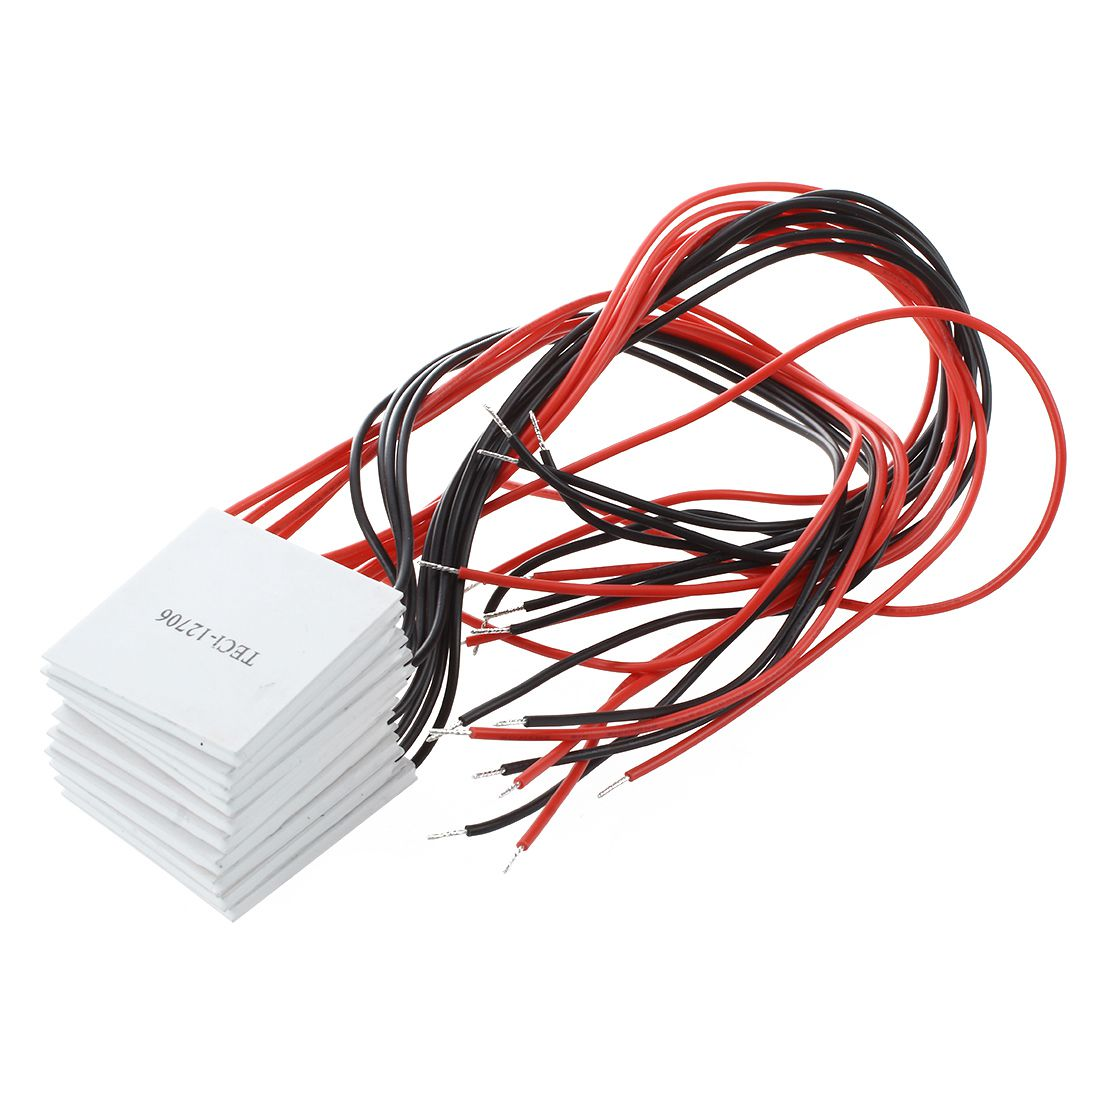 HOT-10 pcs TEC1-12706 Cooler Peltier Effect Thermoelectric Module 12V 60W 72W